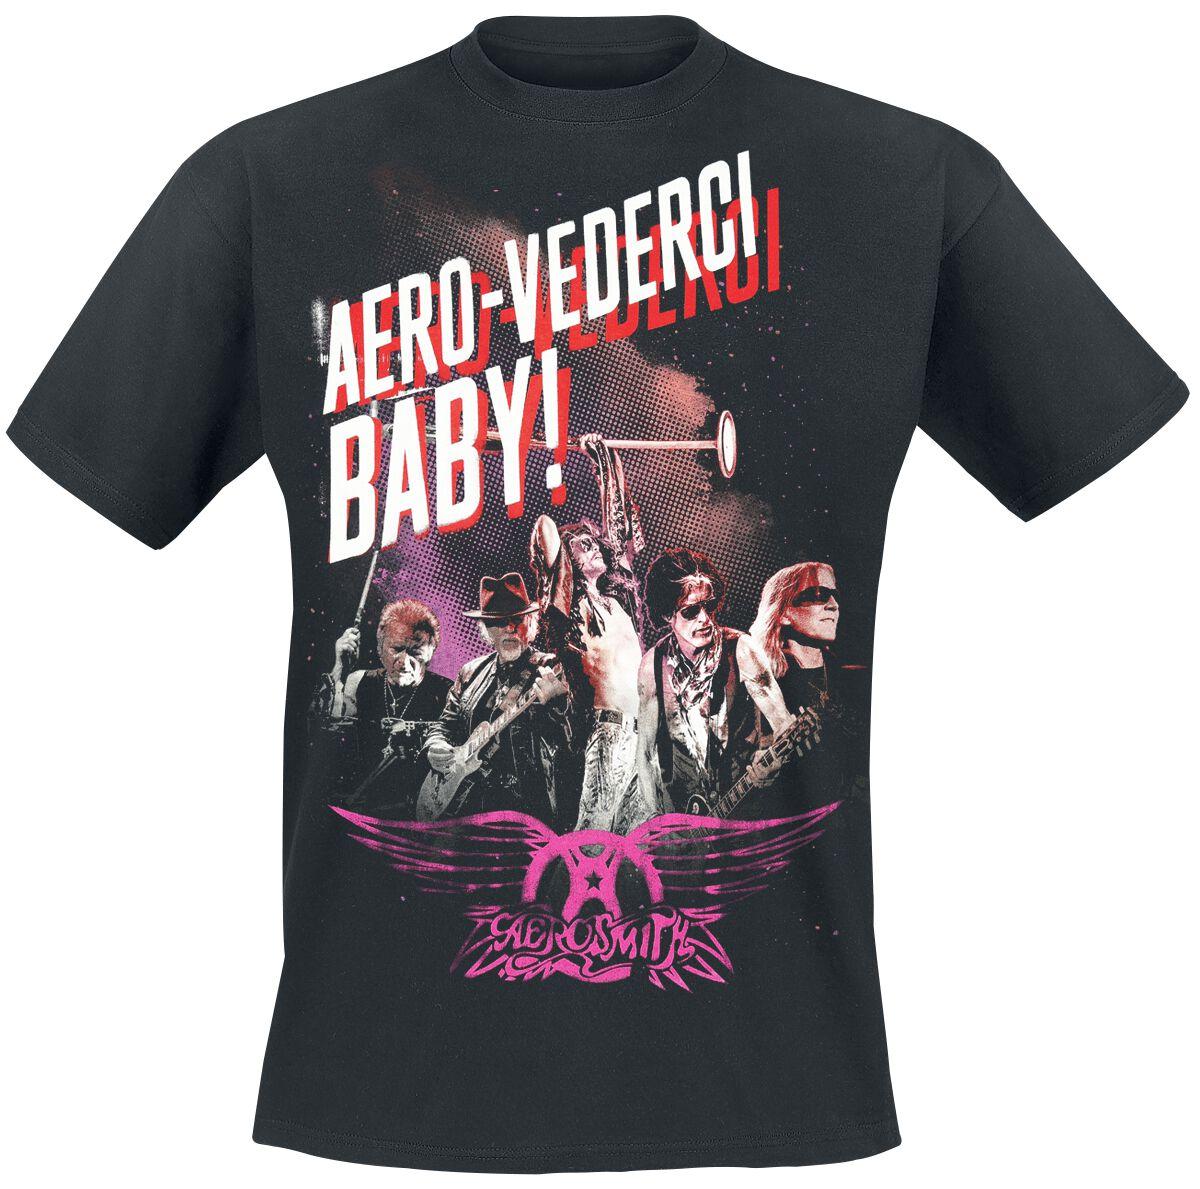 Zespoły - Koszulki - T-Shirt Aerosmith Aero-Vederci Baby Tour 2017 T-Shirt czarny - 366644